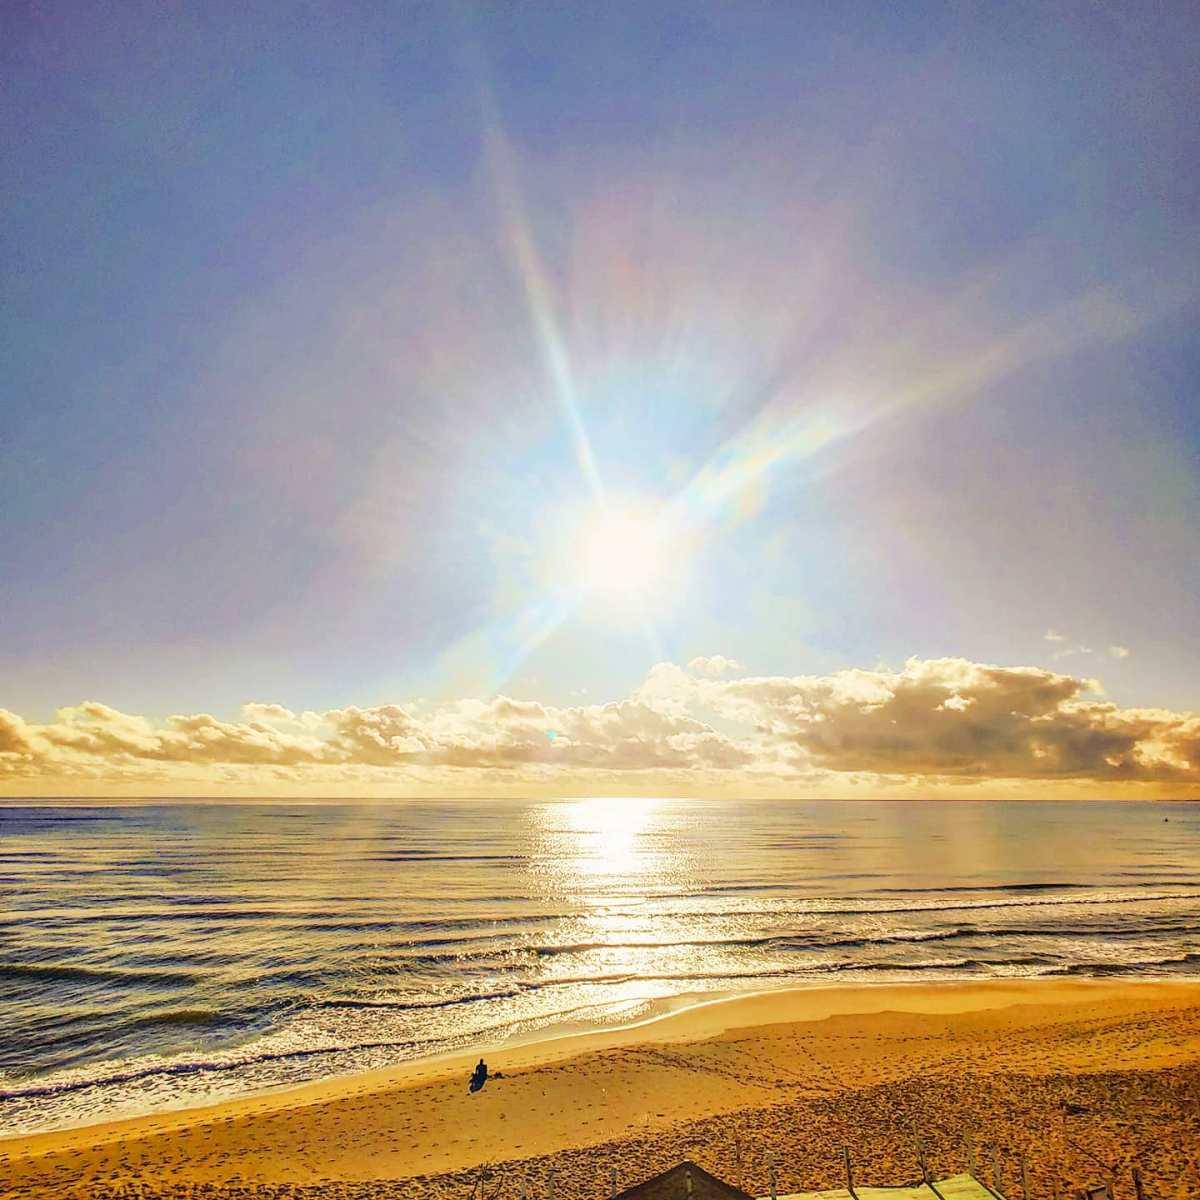 The bright light of the sun after the rain 🔆🤙#sabaudia #sunglare #gold #traveler #beachlife #travellife #travelblog #beach #travelholic #travelphotography #traveling #spiaggia #clouds #travelingram #travel #seaside #travelgram #travelphoto #travels #traveller #traveladdict #sunny #travelstoke #mare #sole